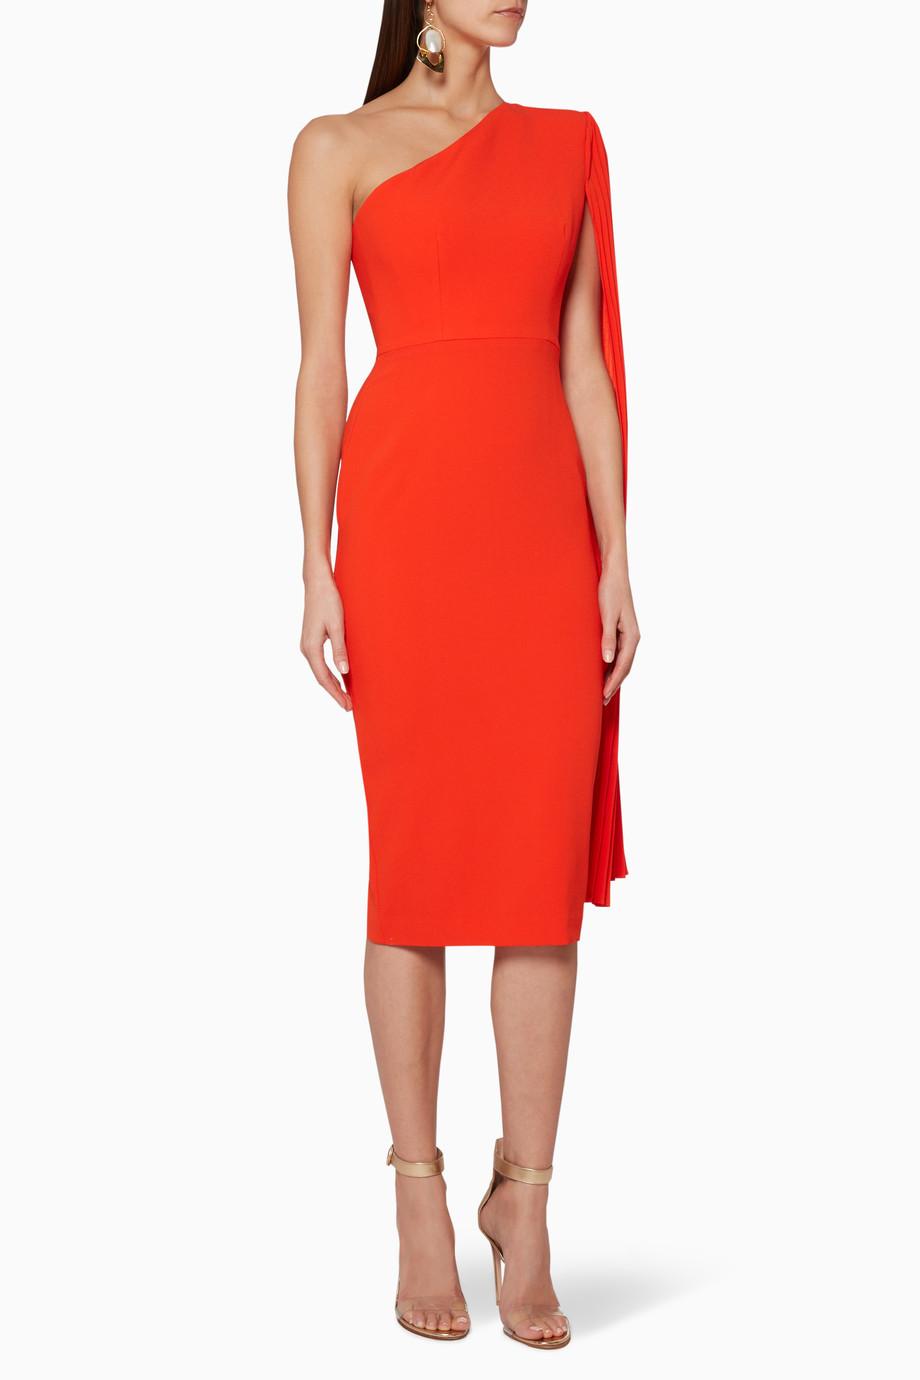 7c55b9b0de2 Shop Alex Perry Orange Tangerine-Orange One-Shoulder Lorin Dress for ...